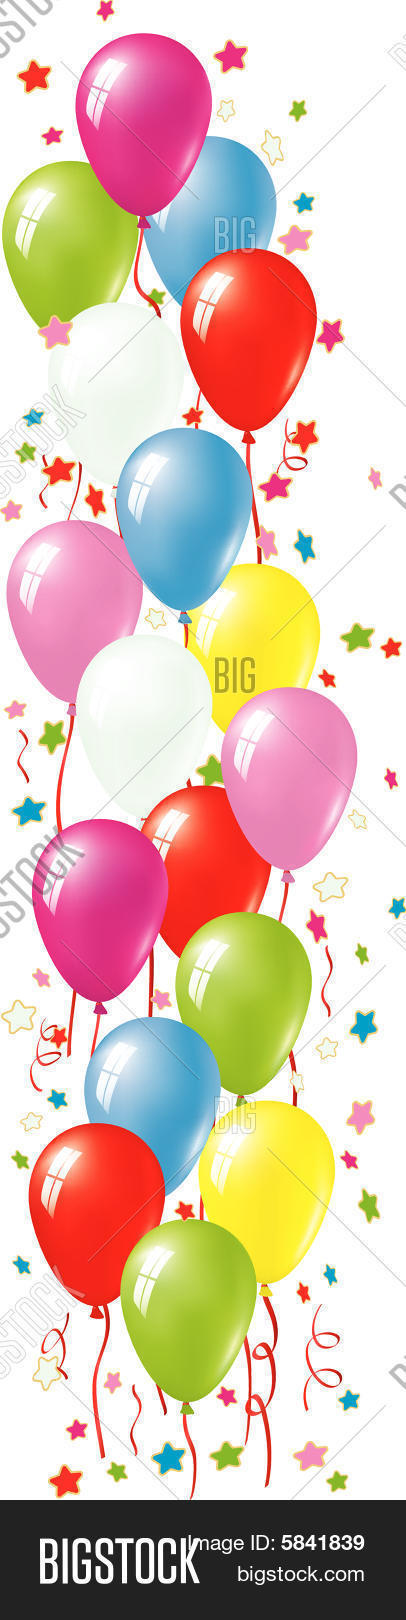 Balloon border vector photo free trial bigstock balloon border thecheapjerseys Images